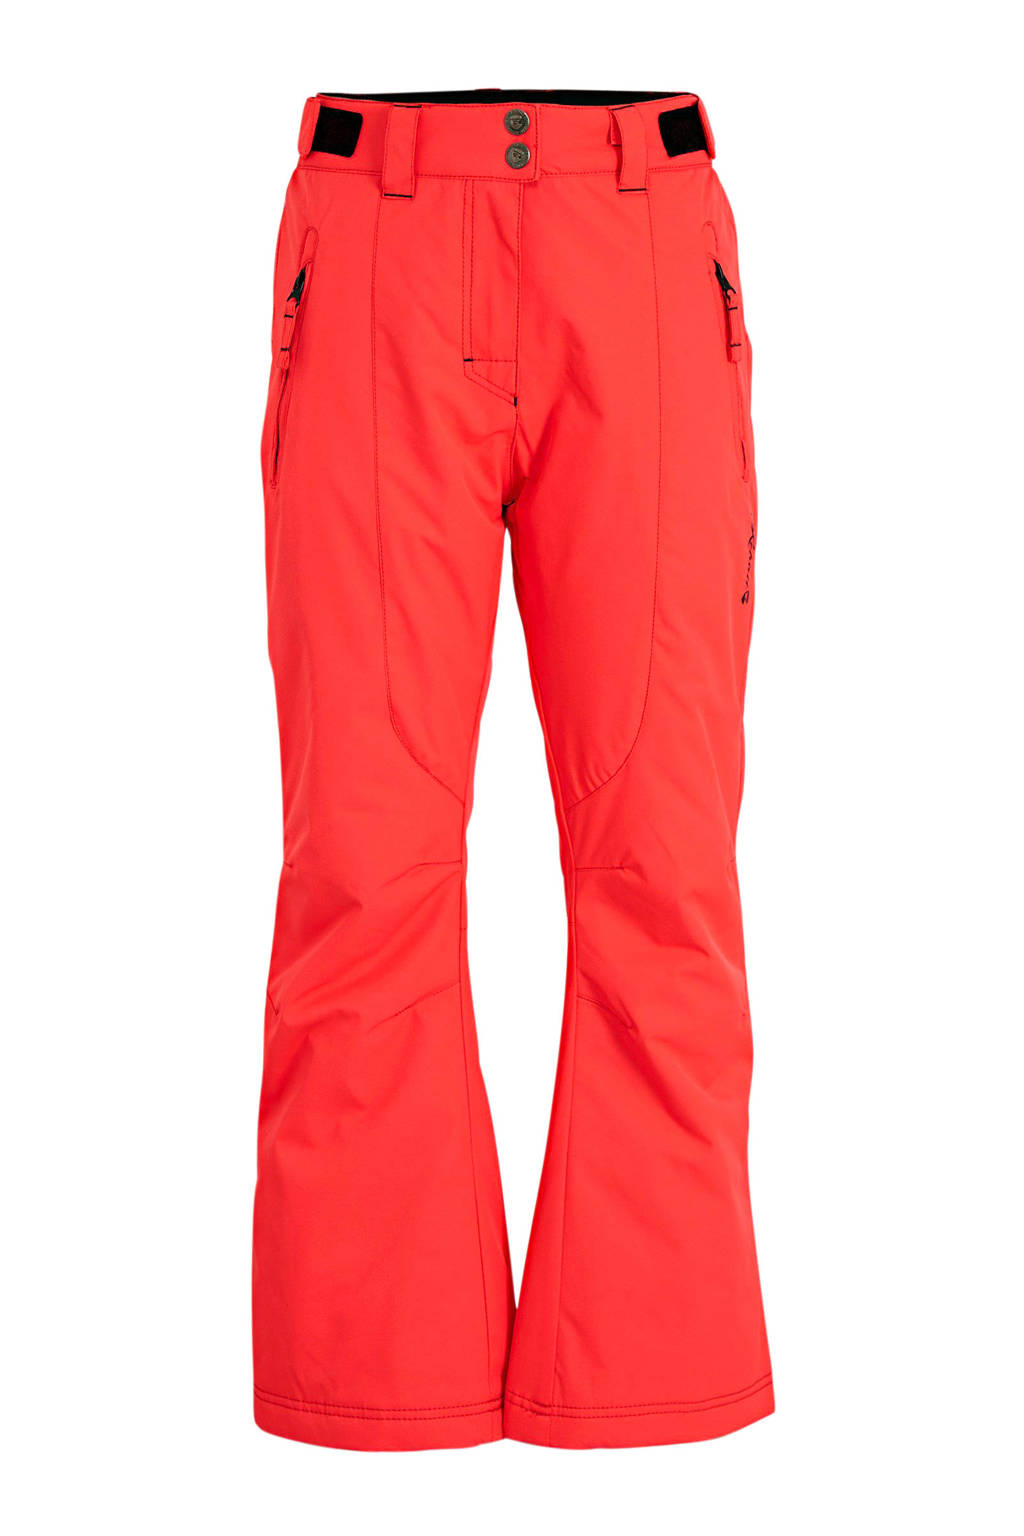 Rehall skibroek Abbey-R jr rood, Rood